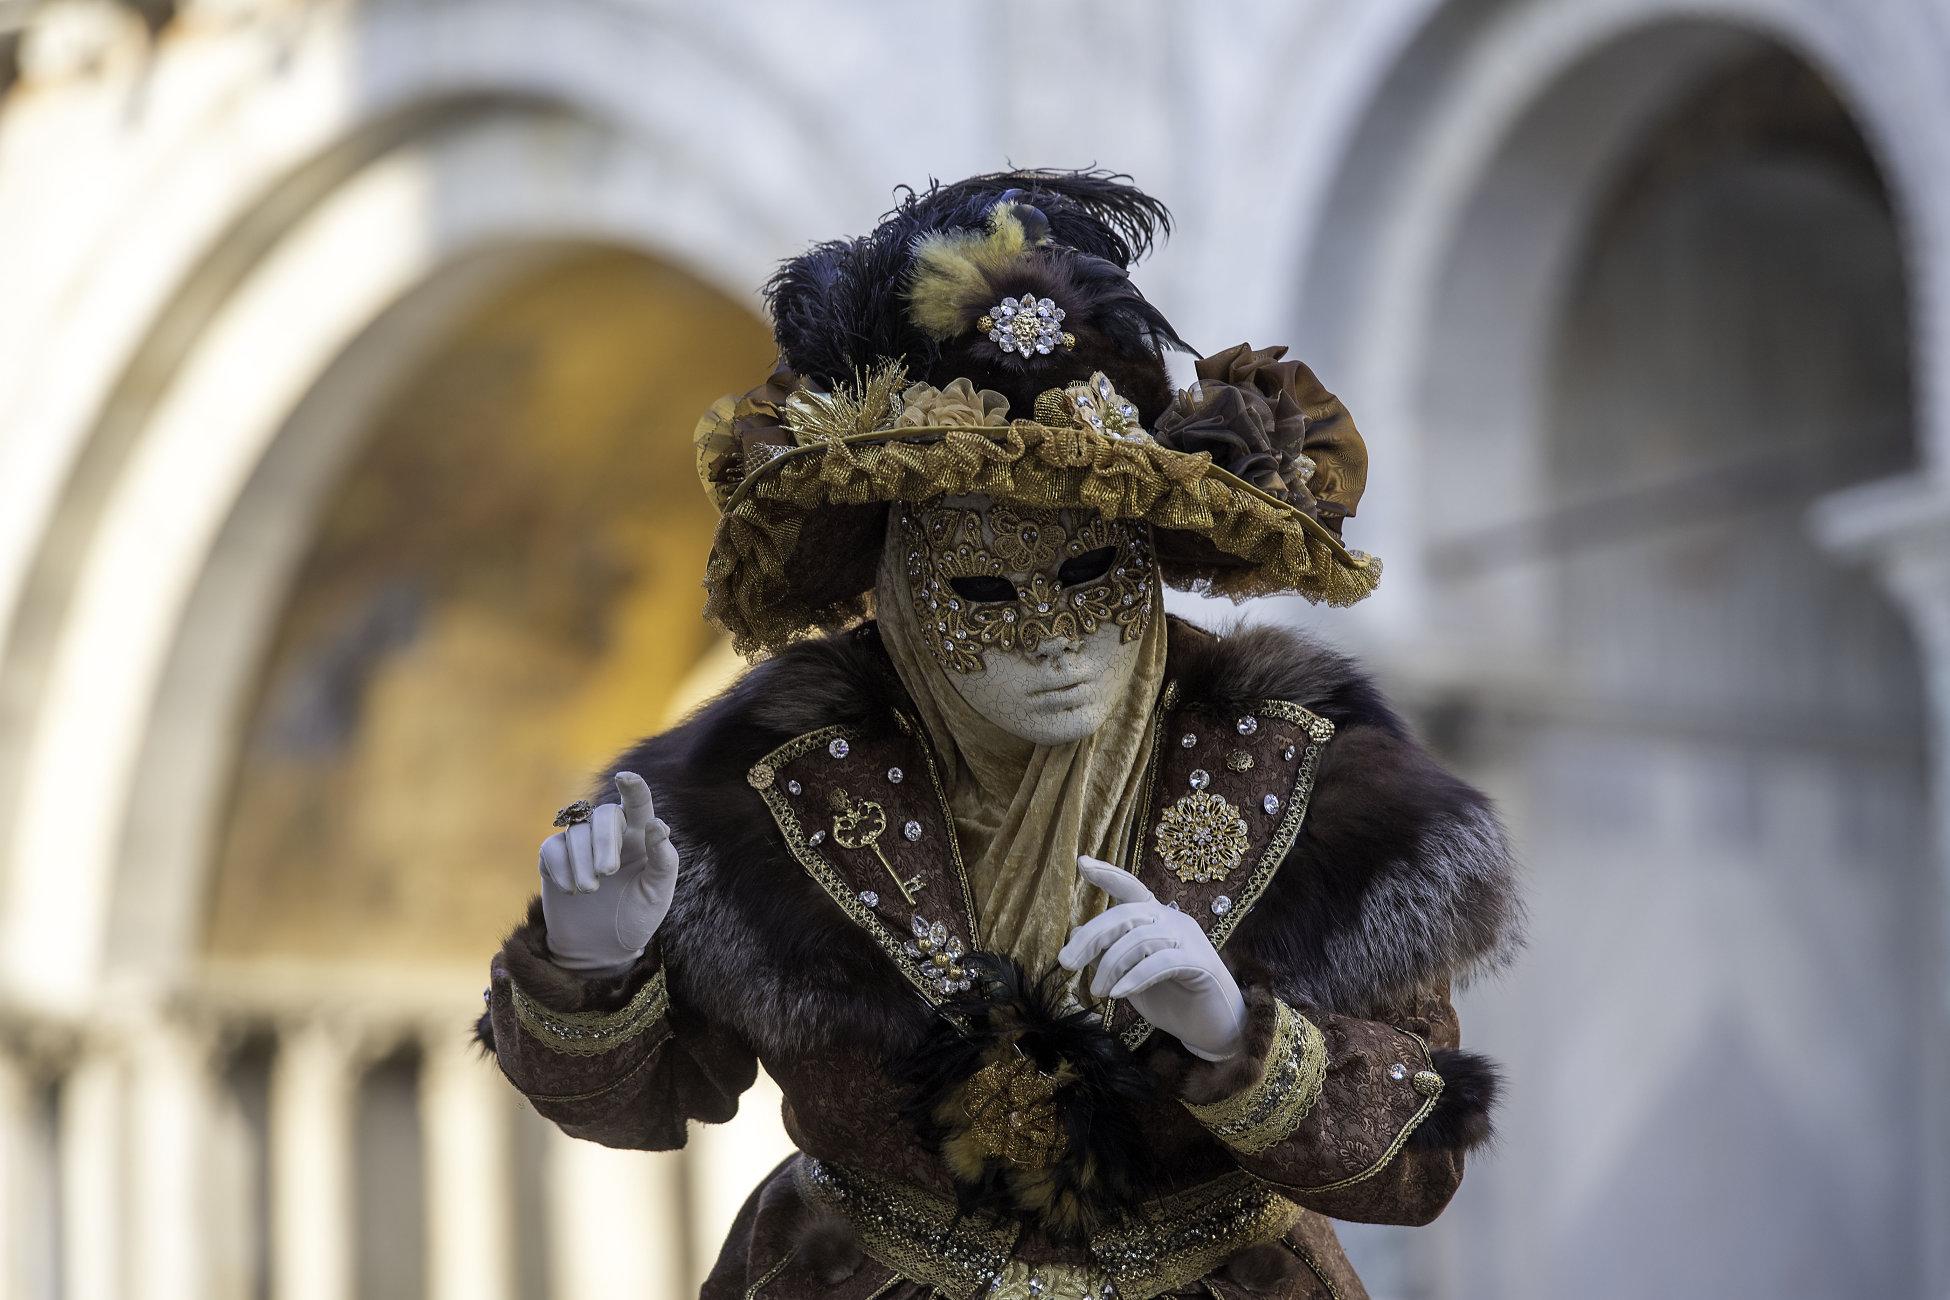 Venice Carnival 2020 - Part 1